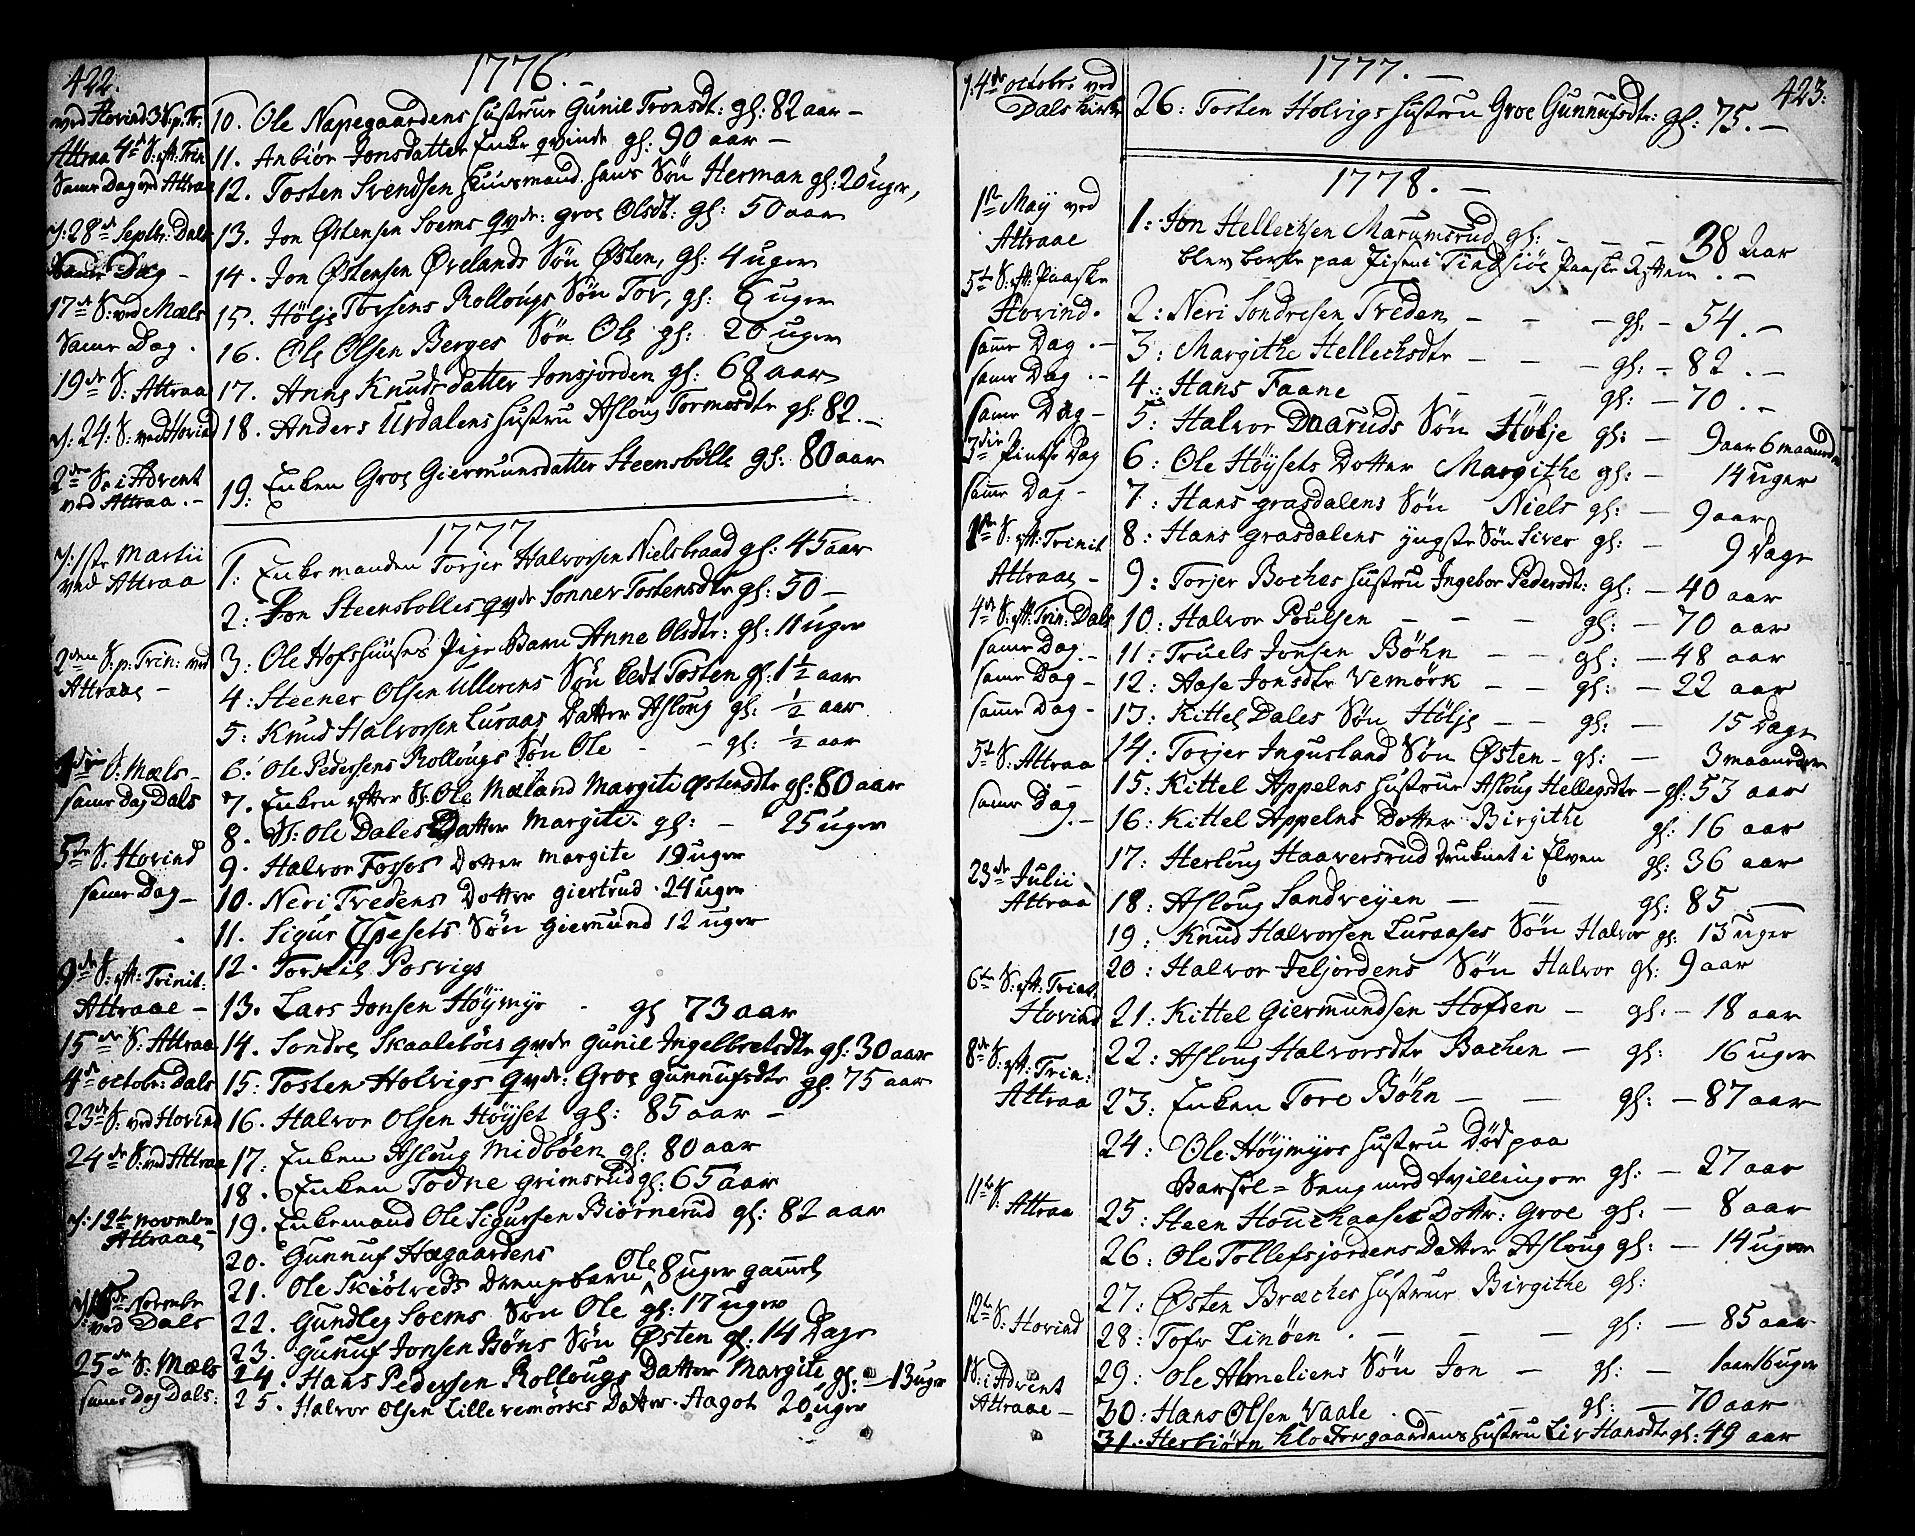 SAKO, Tinn kirkebøker, F/Fa/L0002: Ministerialbok nr. I 2, 1757-1810, s. 422-423